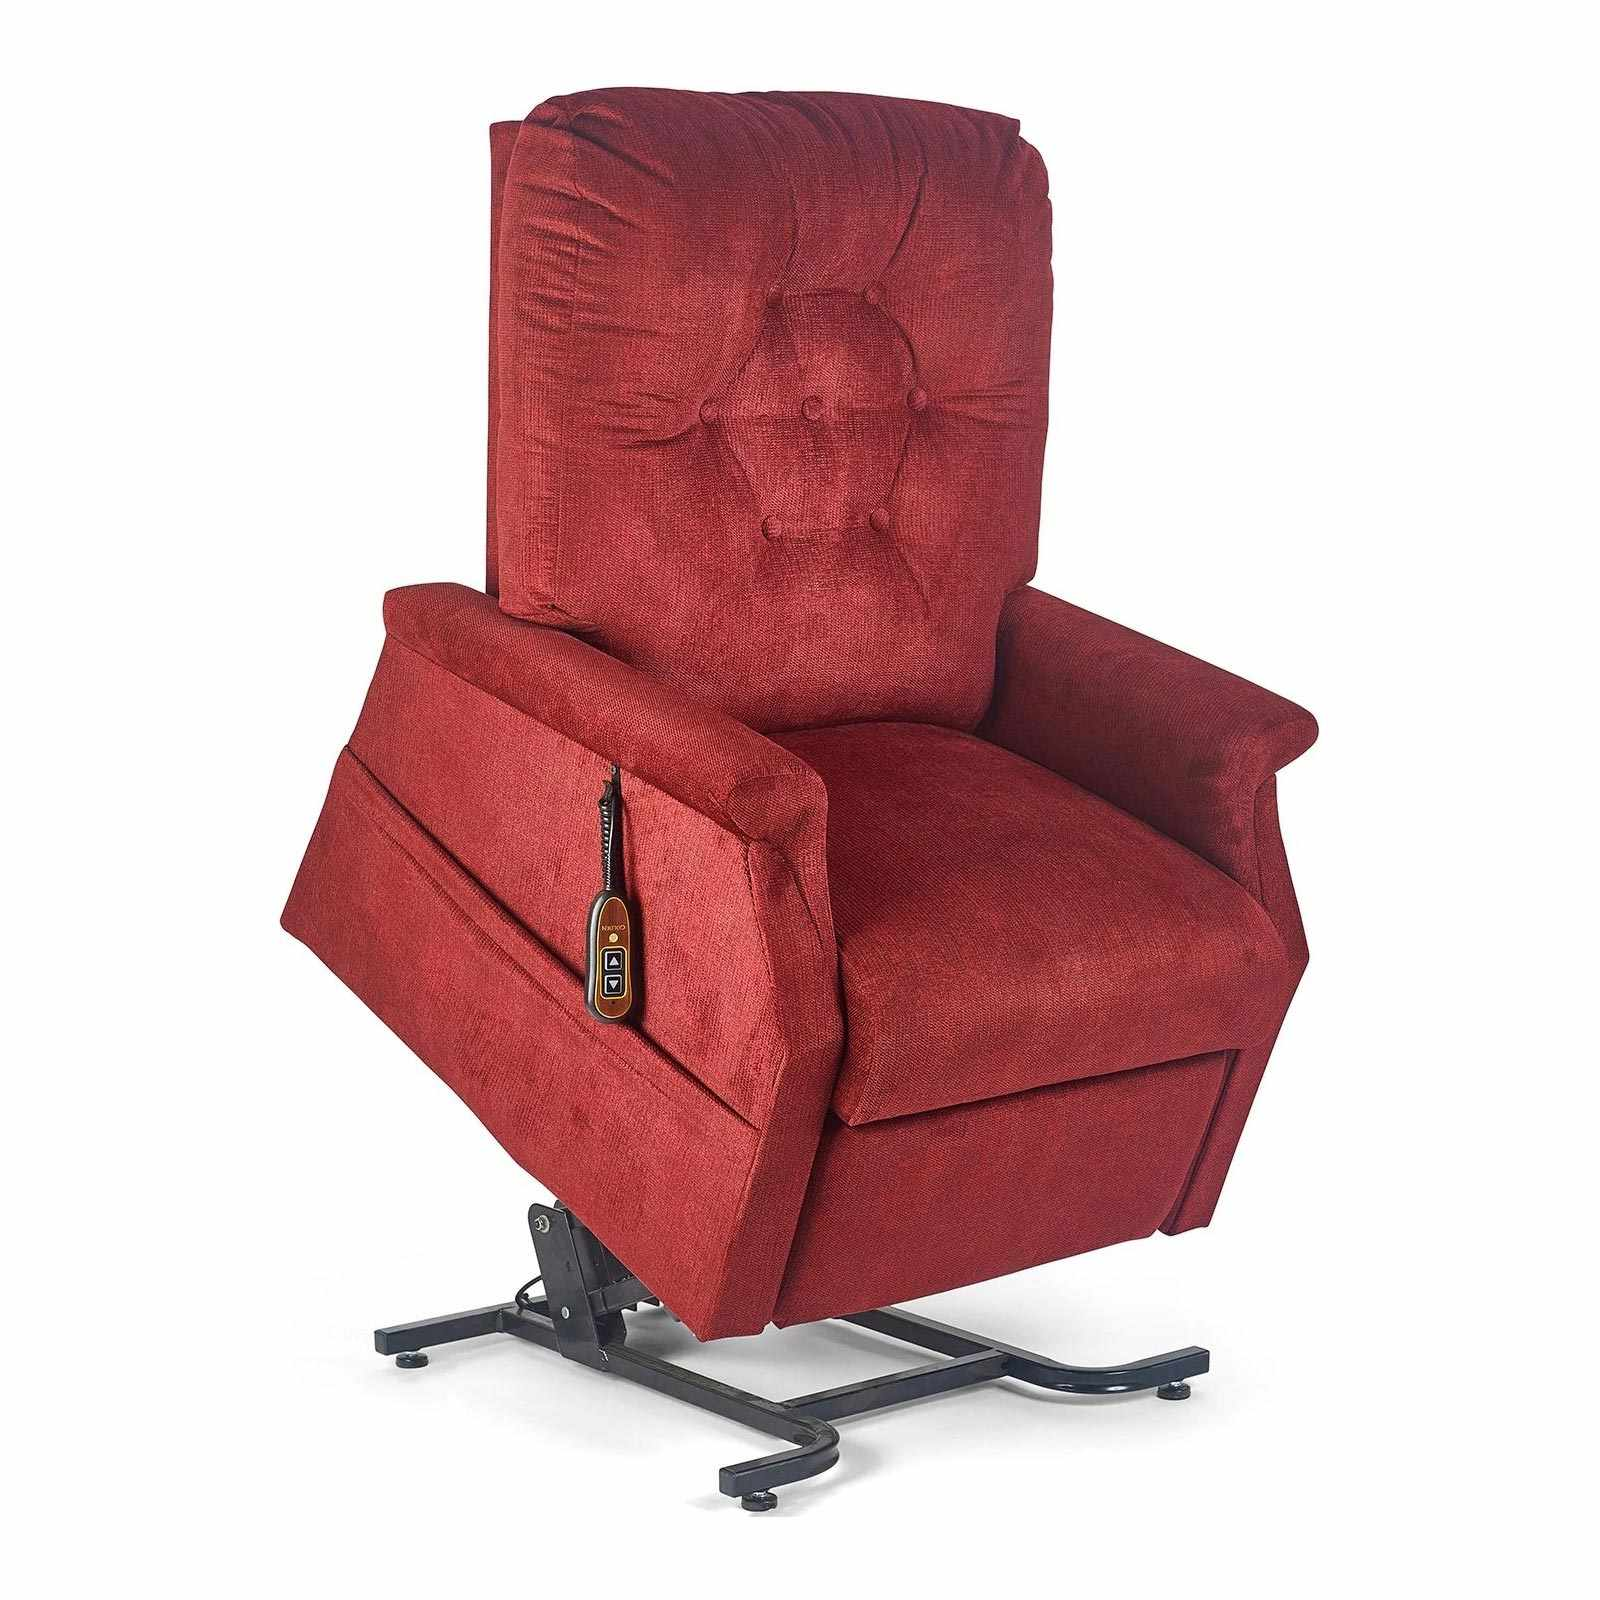 Golden Technologies Capri PR200 Lift Recliner Chair | Medicaleshop